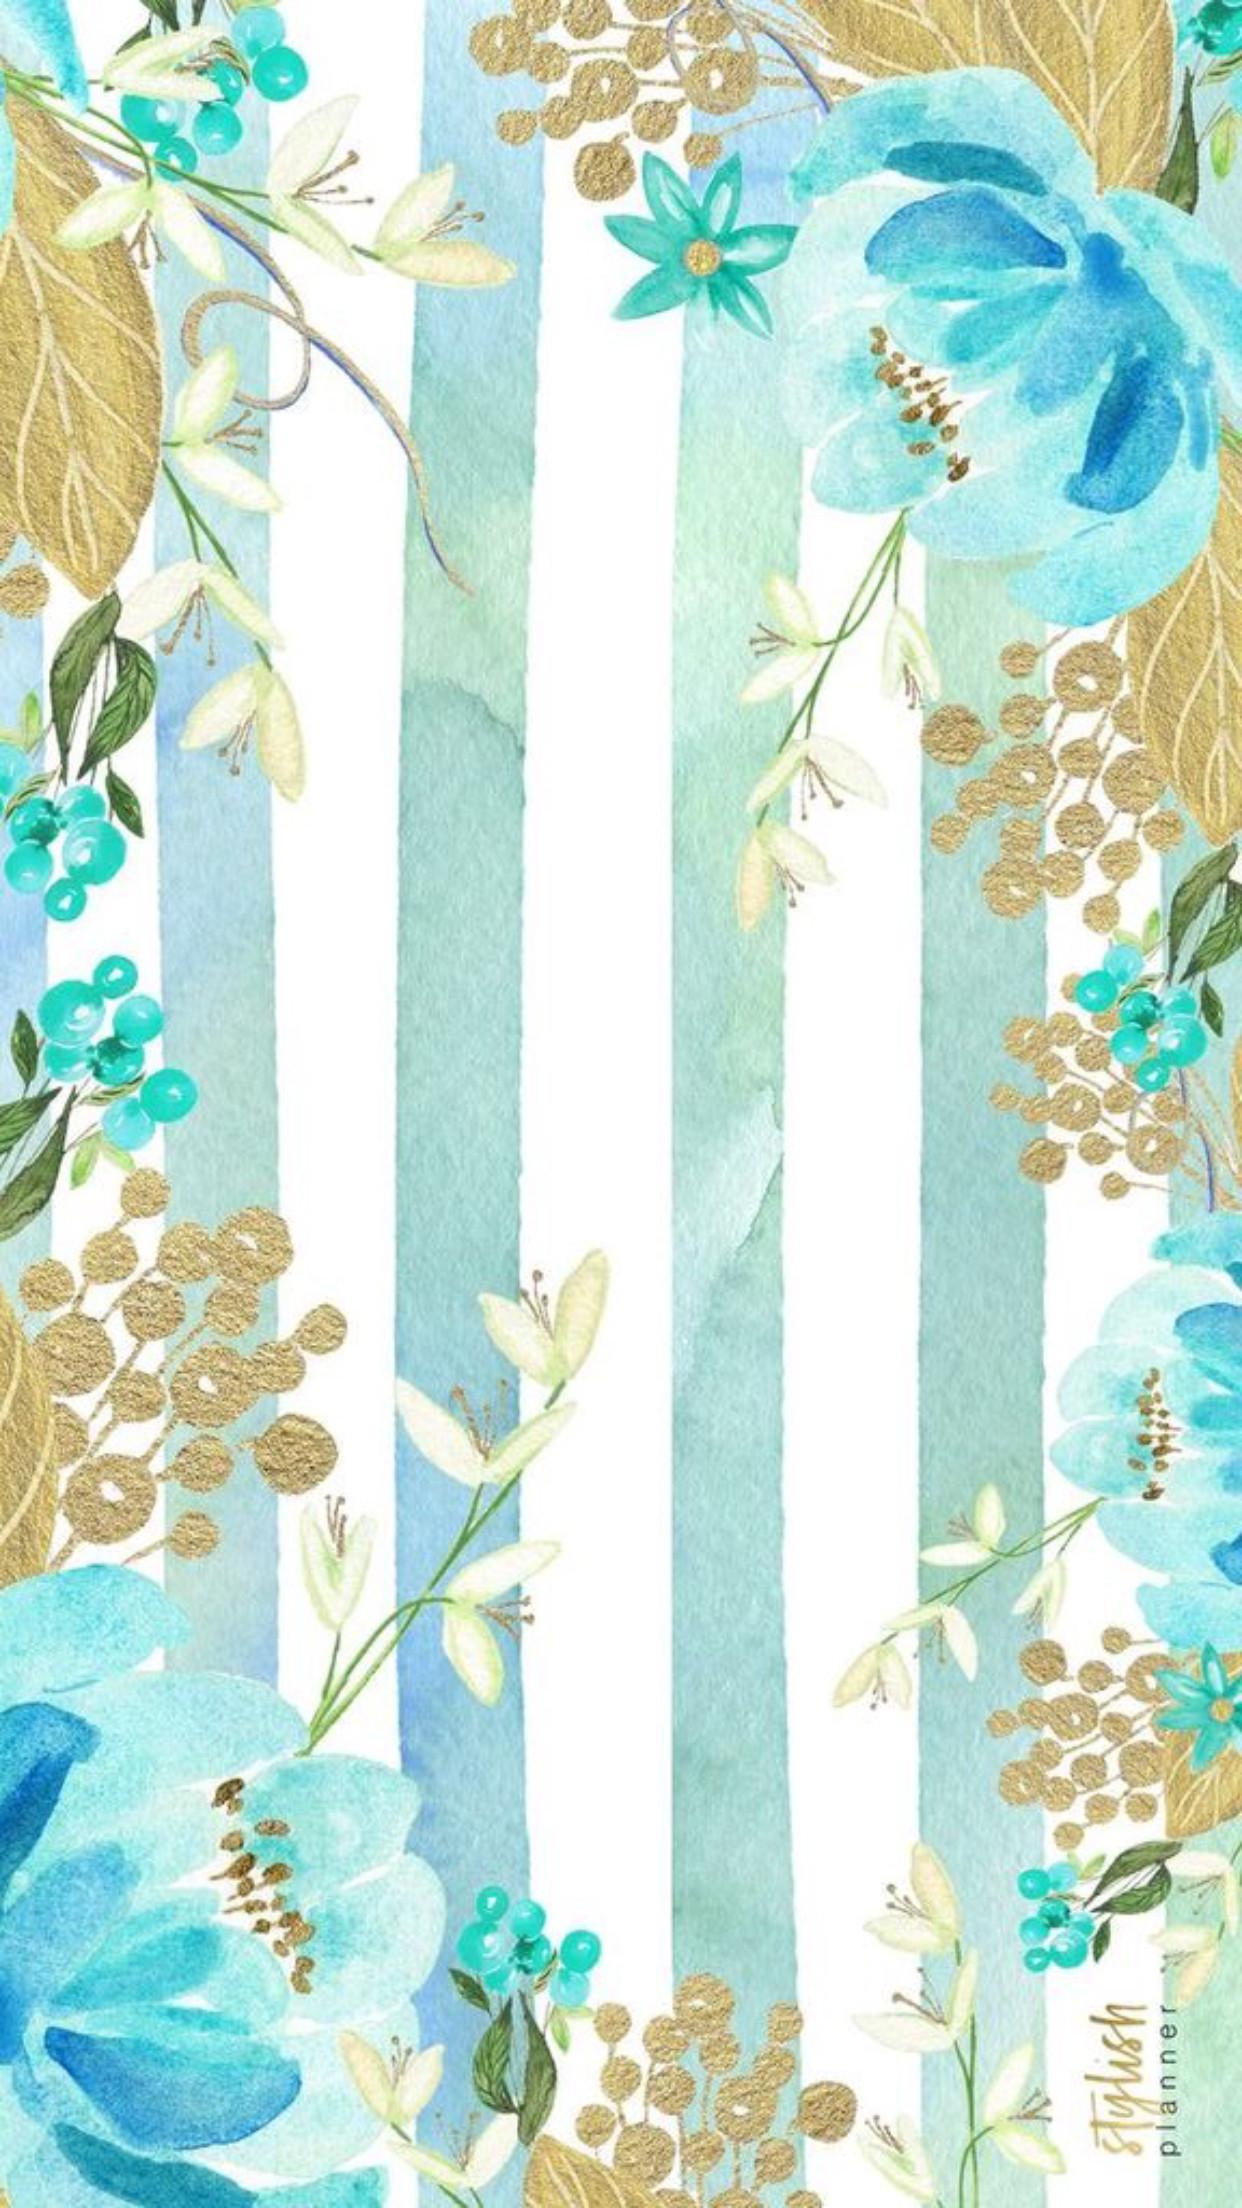 pretty background!!! Wallpaper Iphone VintagePhone WallpapersIphone  BackroundsFlower WallpaperBlue BackgroundsAqua …